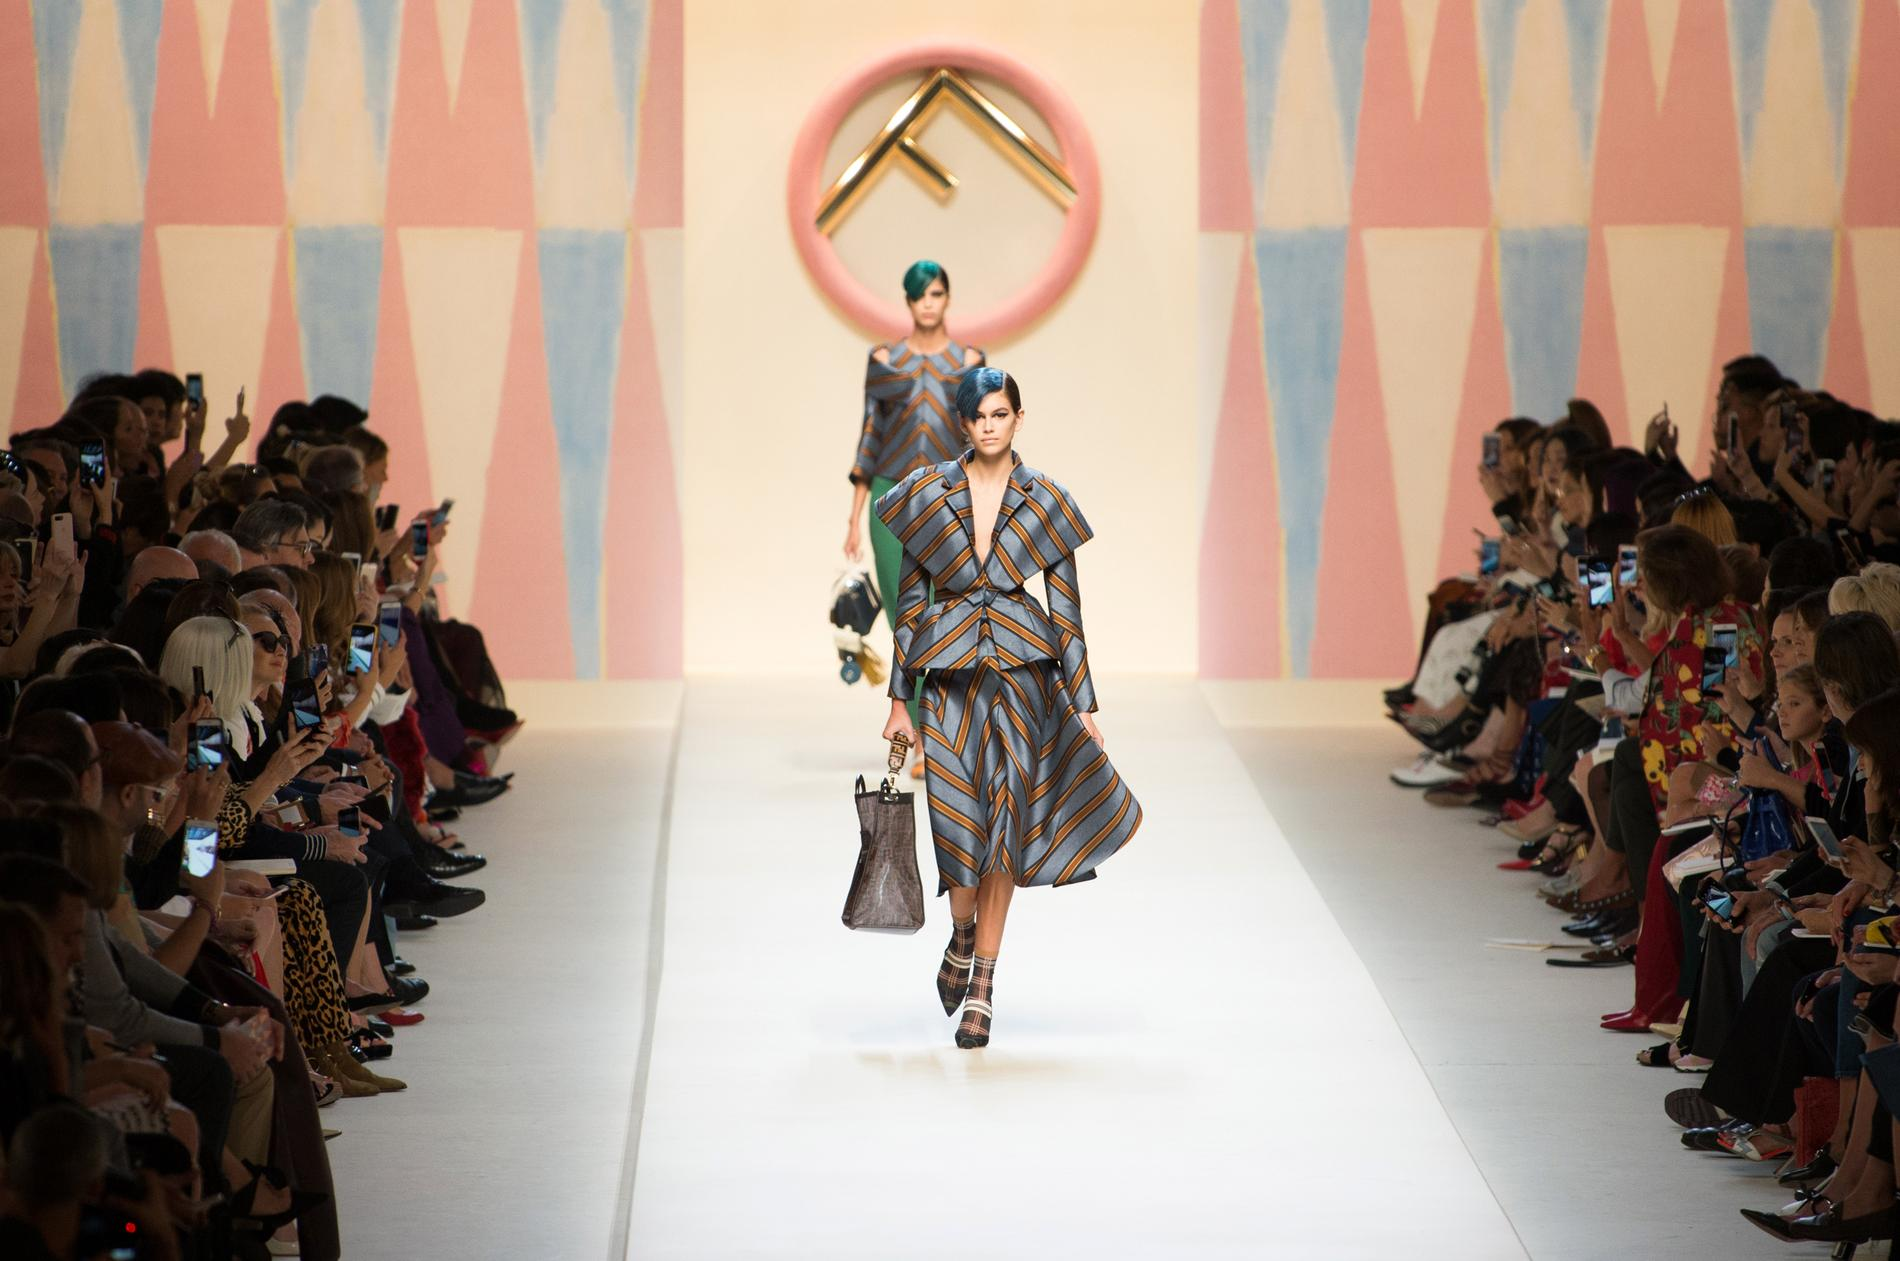 Défilé Fendi printemps-été 2018, Milan - Look 2. Défilé Fendi Prêt-à-porter  Printemps-été 2018 Milan - photo 2 Imaxtree 7d5f004cb04